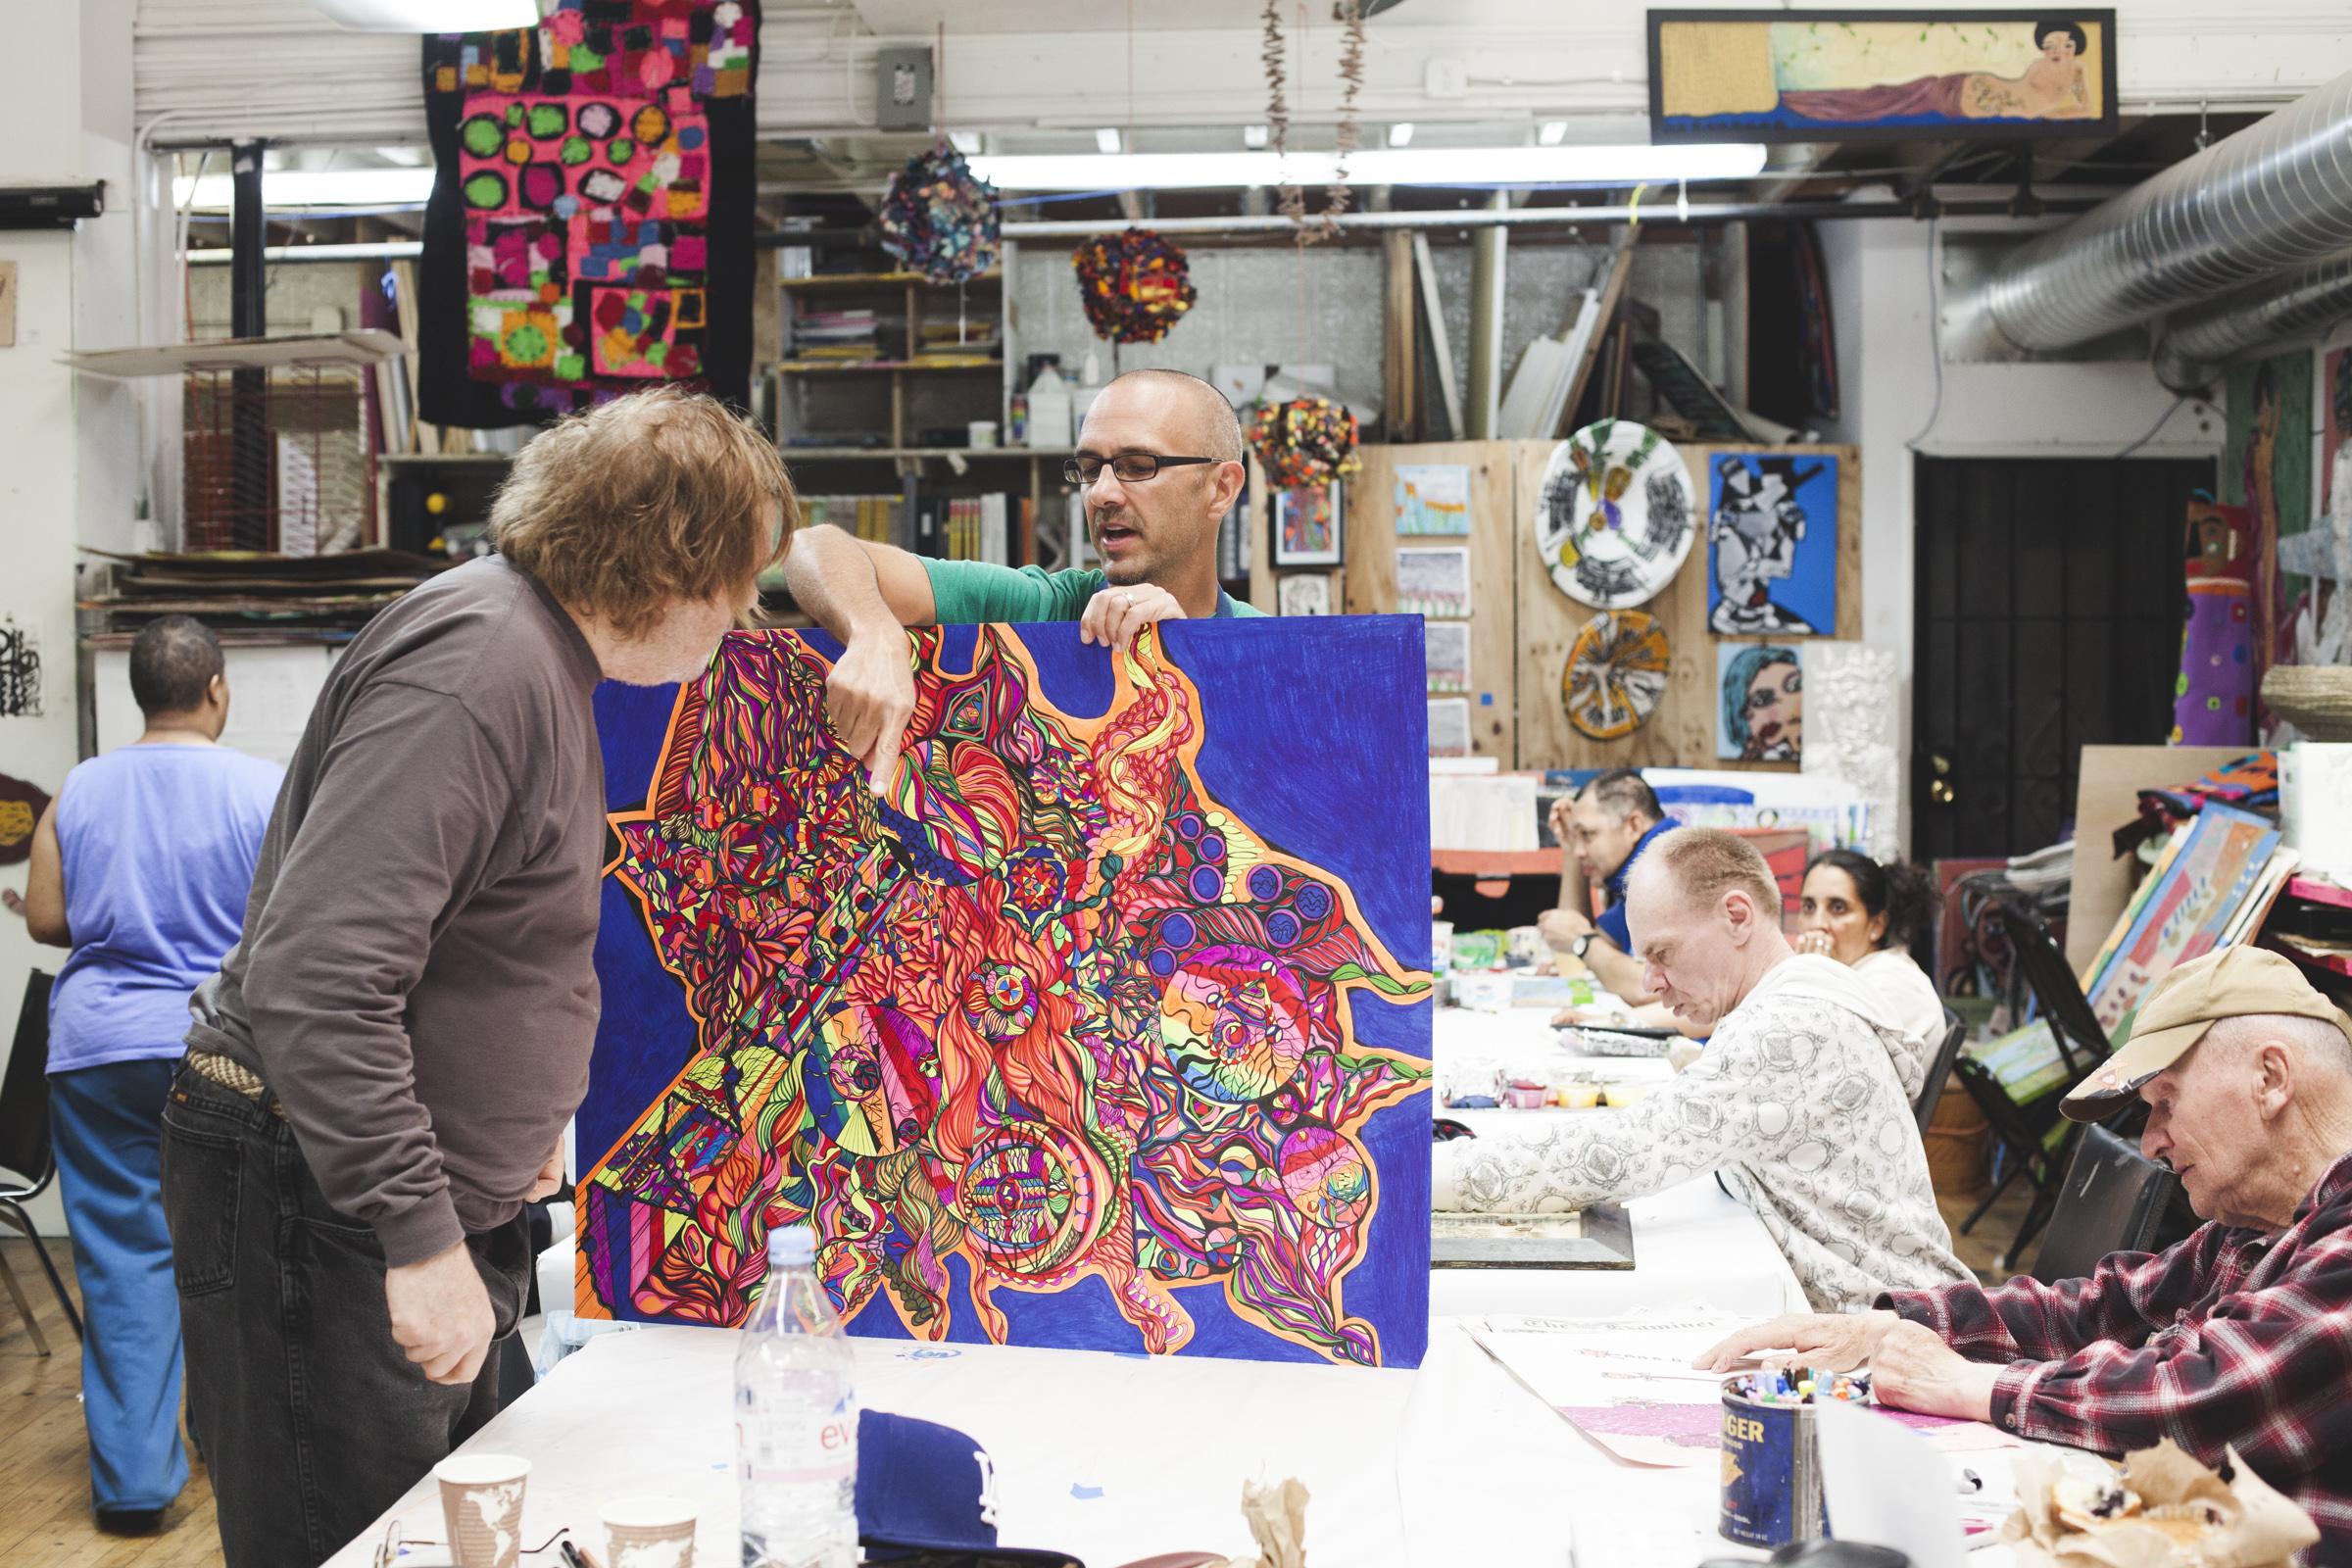 Creativity Explored artist Dan Michiels with Visual Arts Instructor Eric Larson